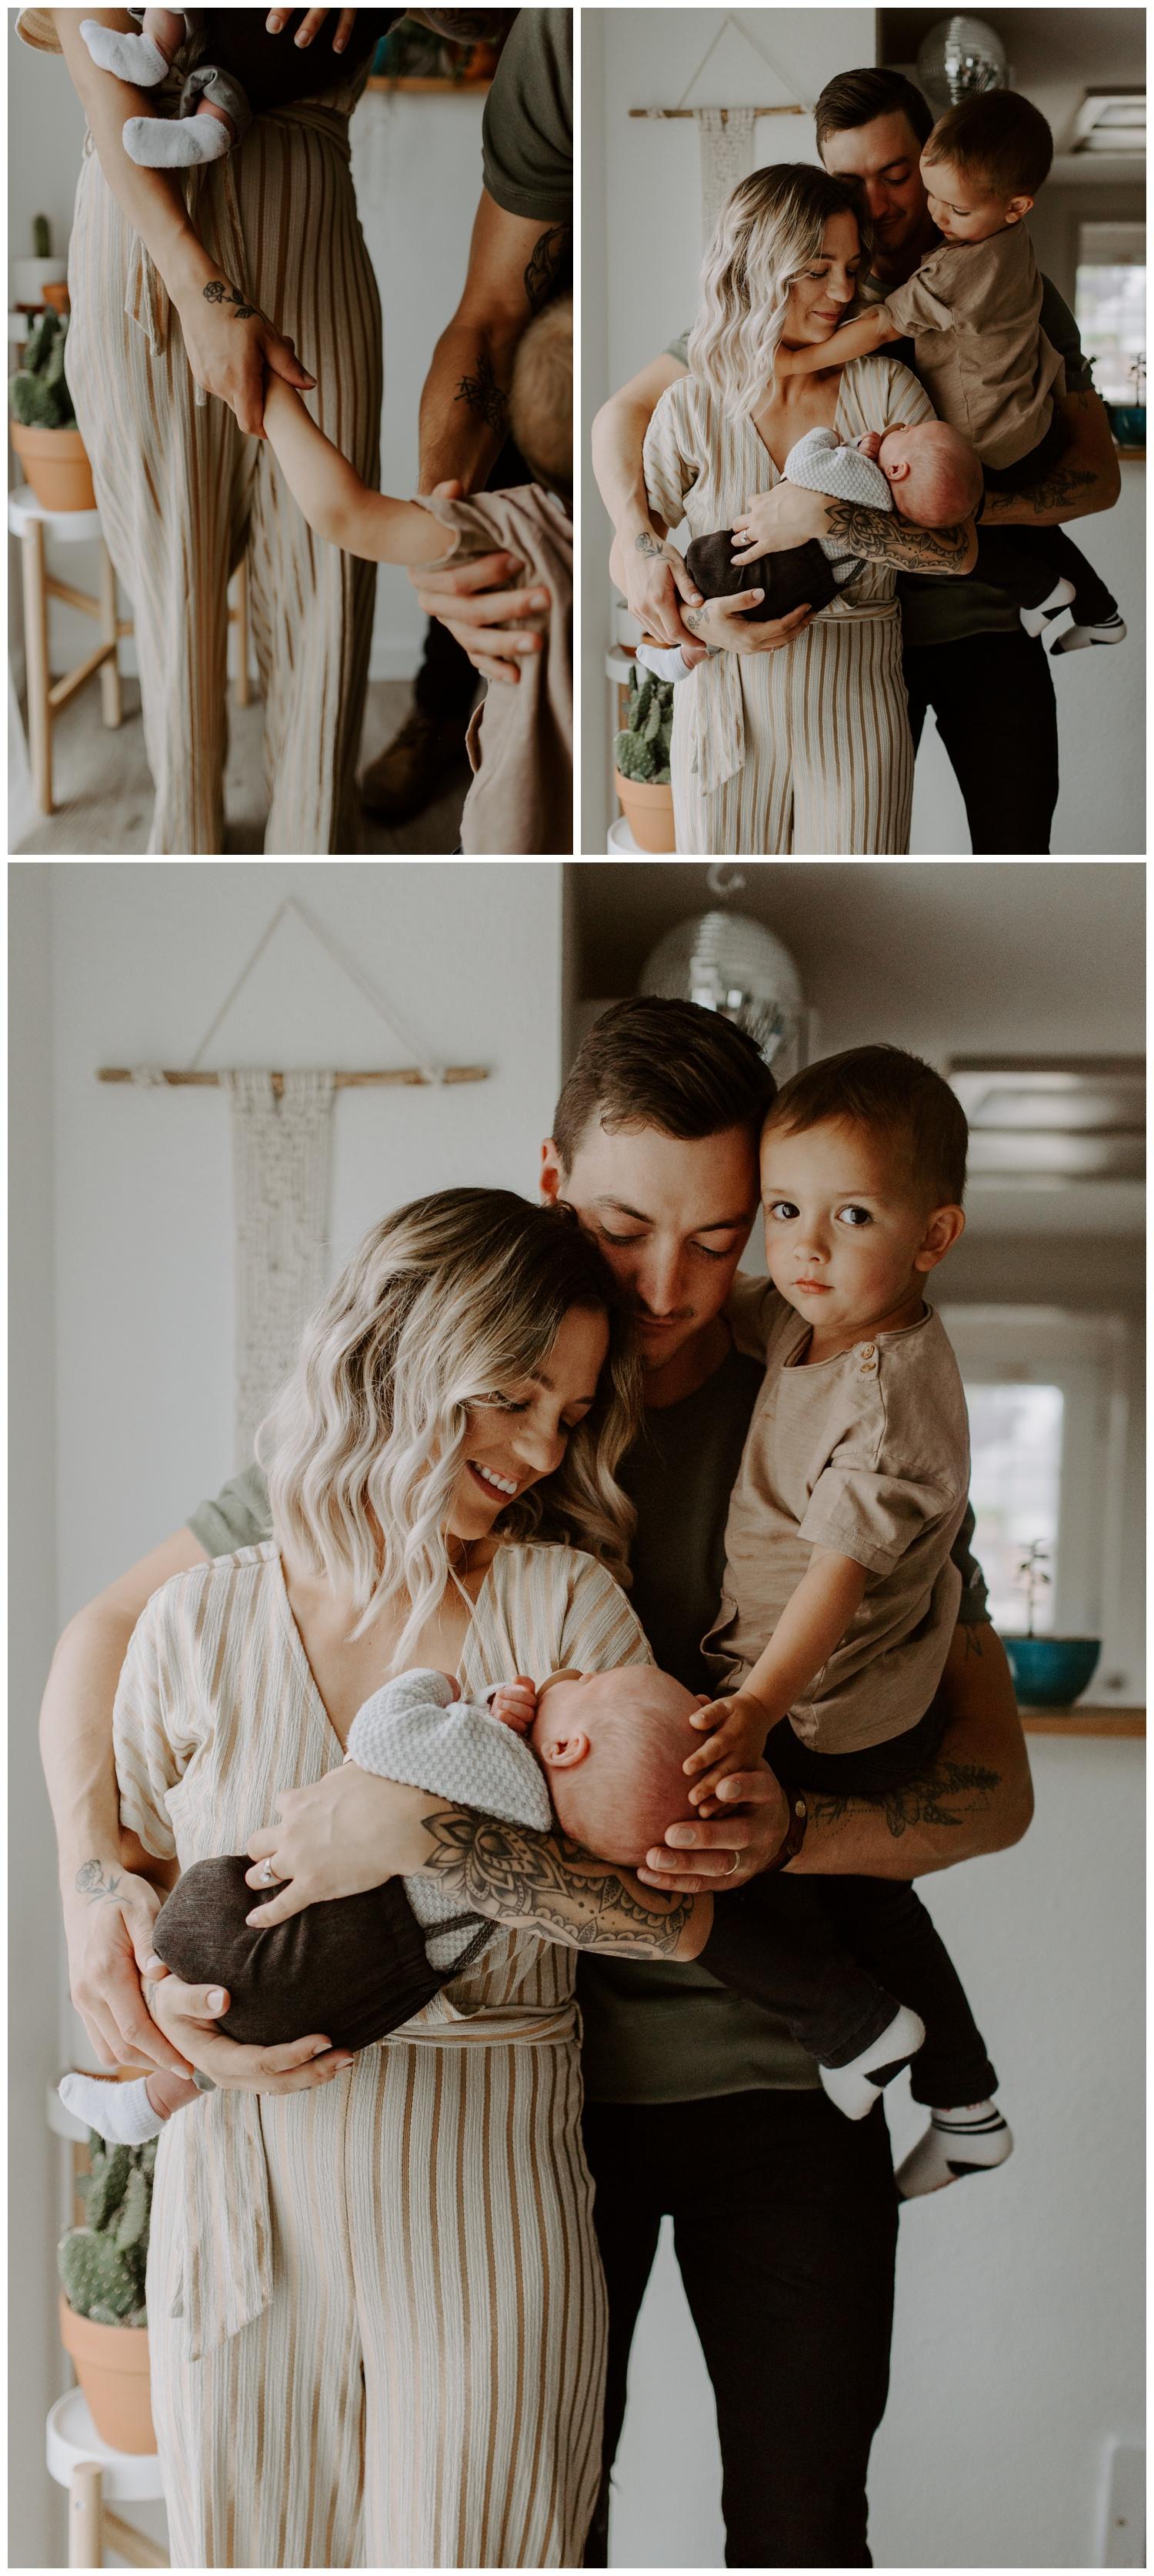 In Home newbordn Session | Washington Lifestyle Family Photographer Jessica Heron Images | jessicaheronimages.com | Newborns with siblingE.JPG